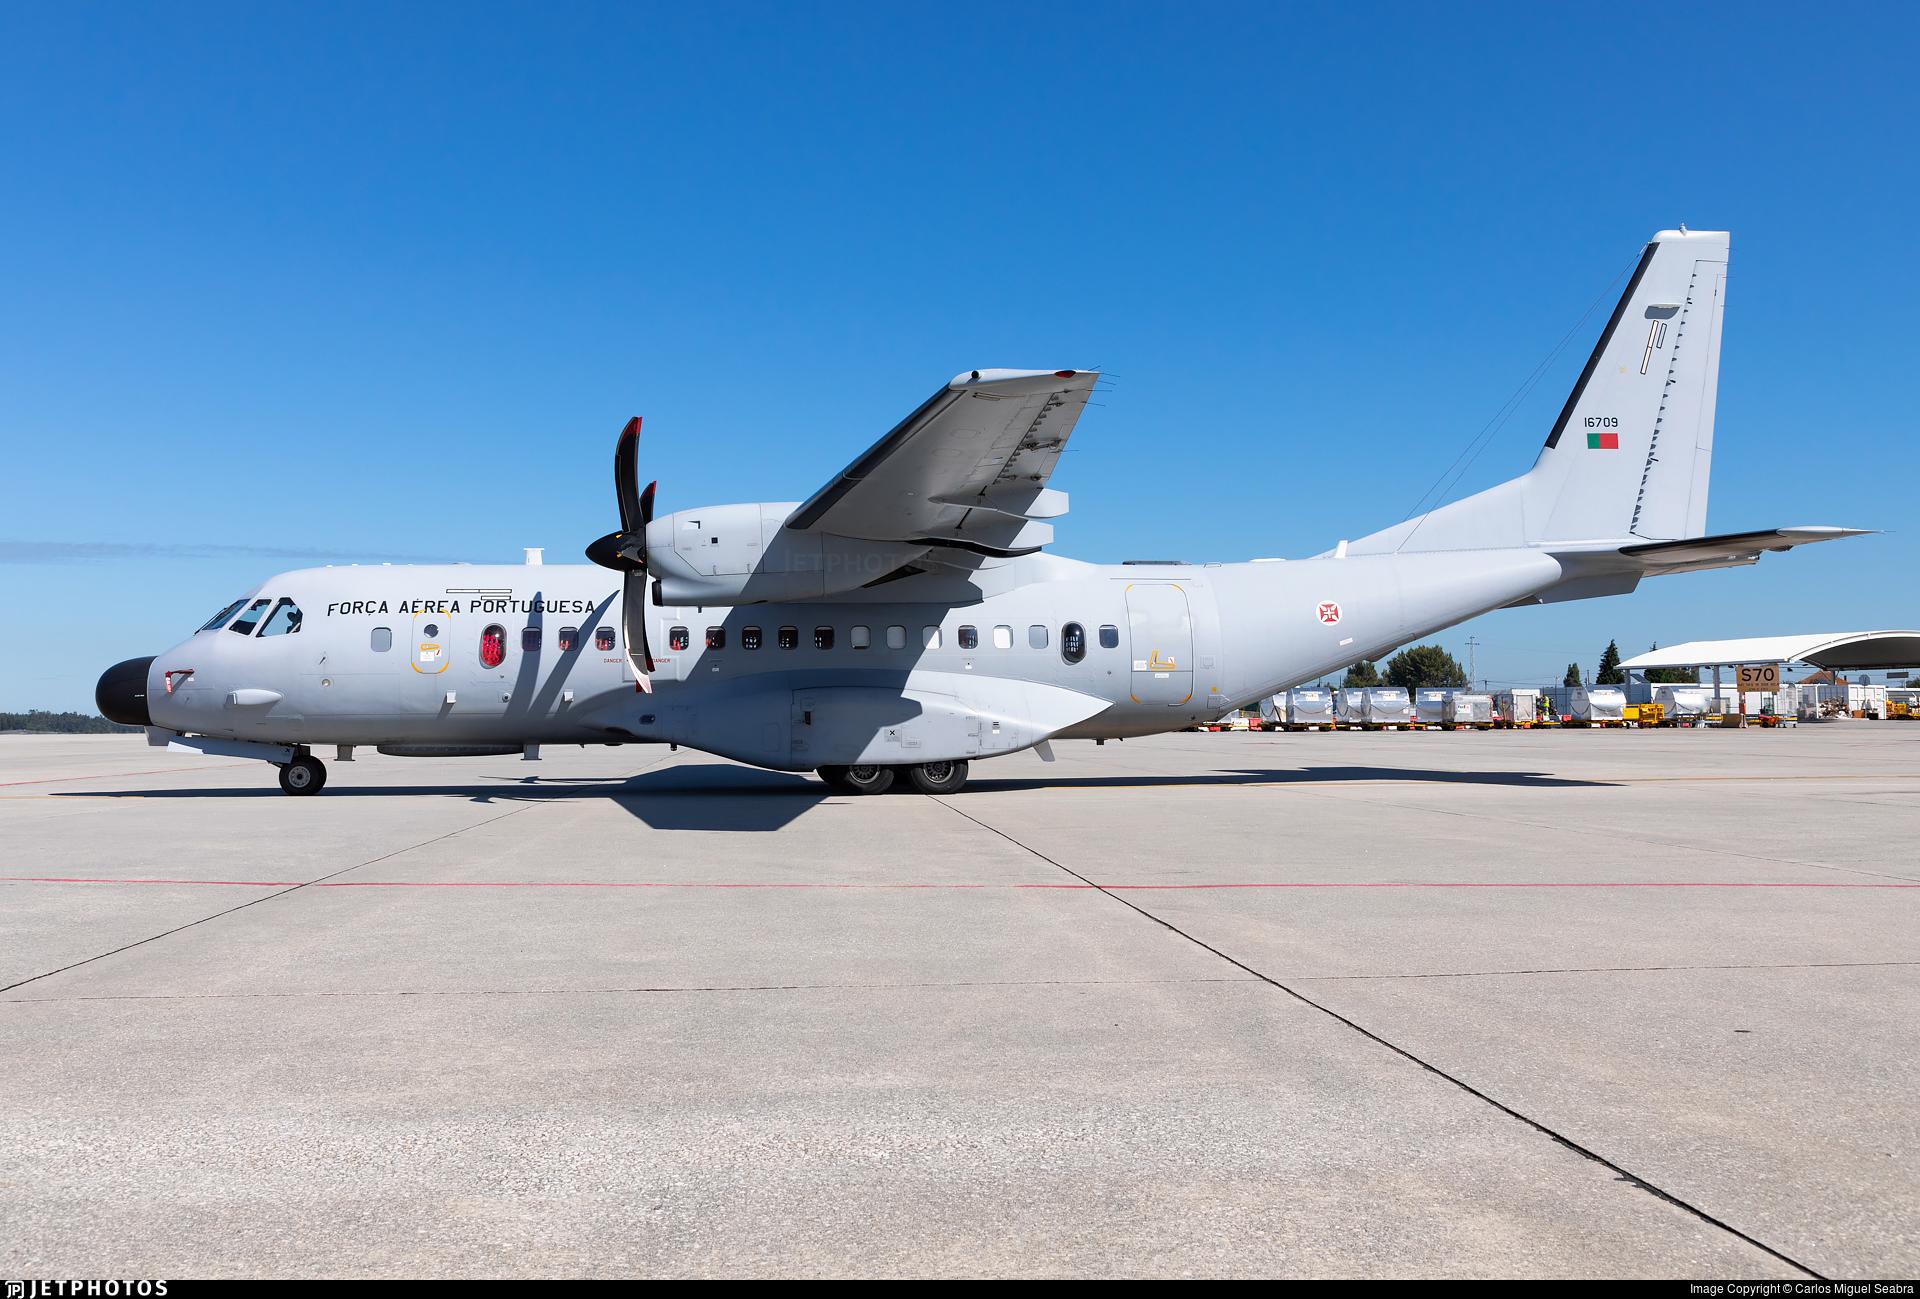 16709 - CASA C-295MP Persuader - Portugal - Air Force